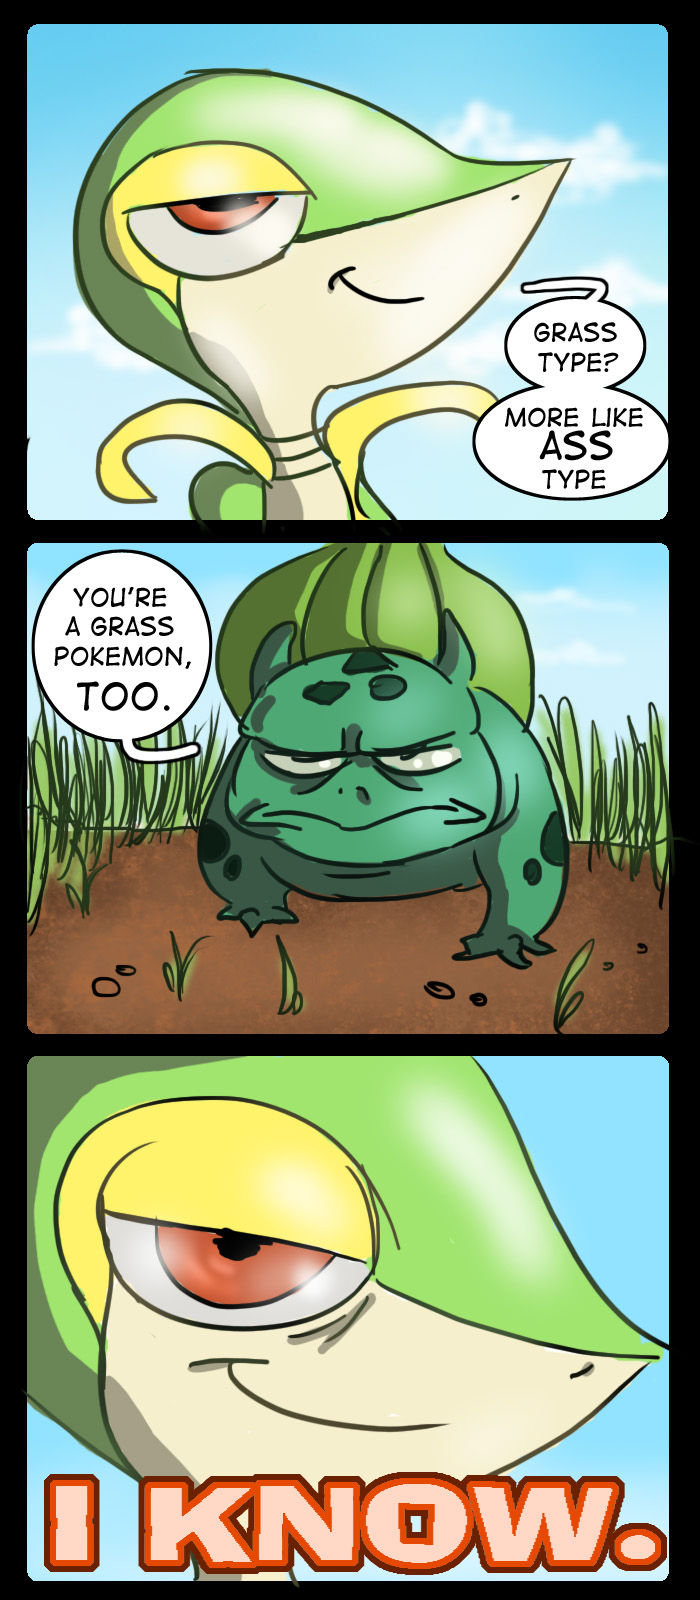 Grass Type More Like Ass Type Pokémon Know Your Meme